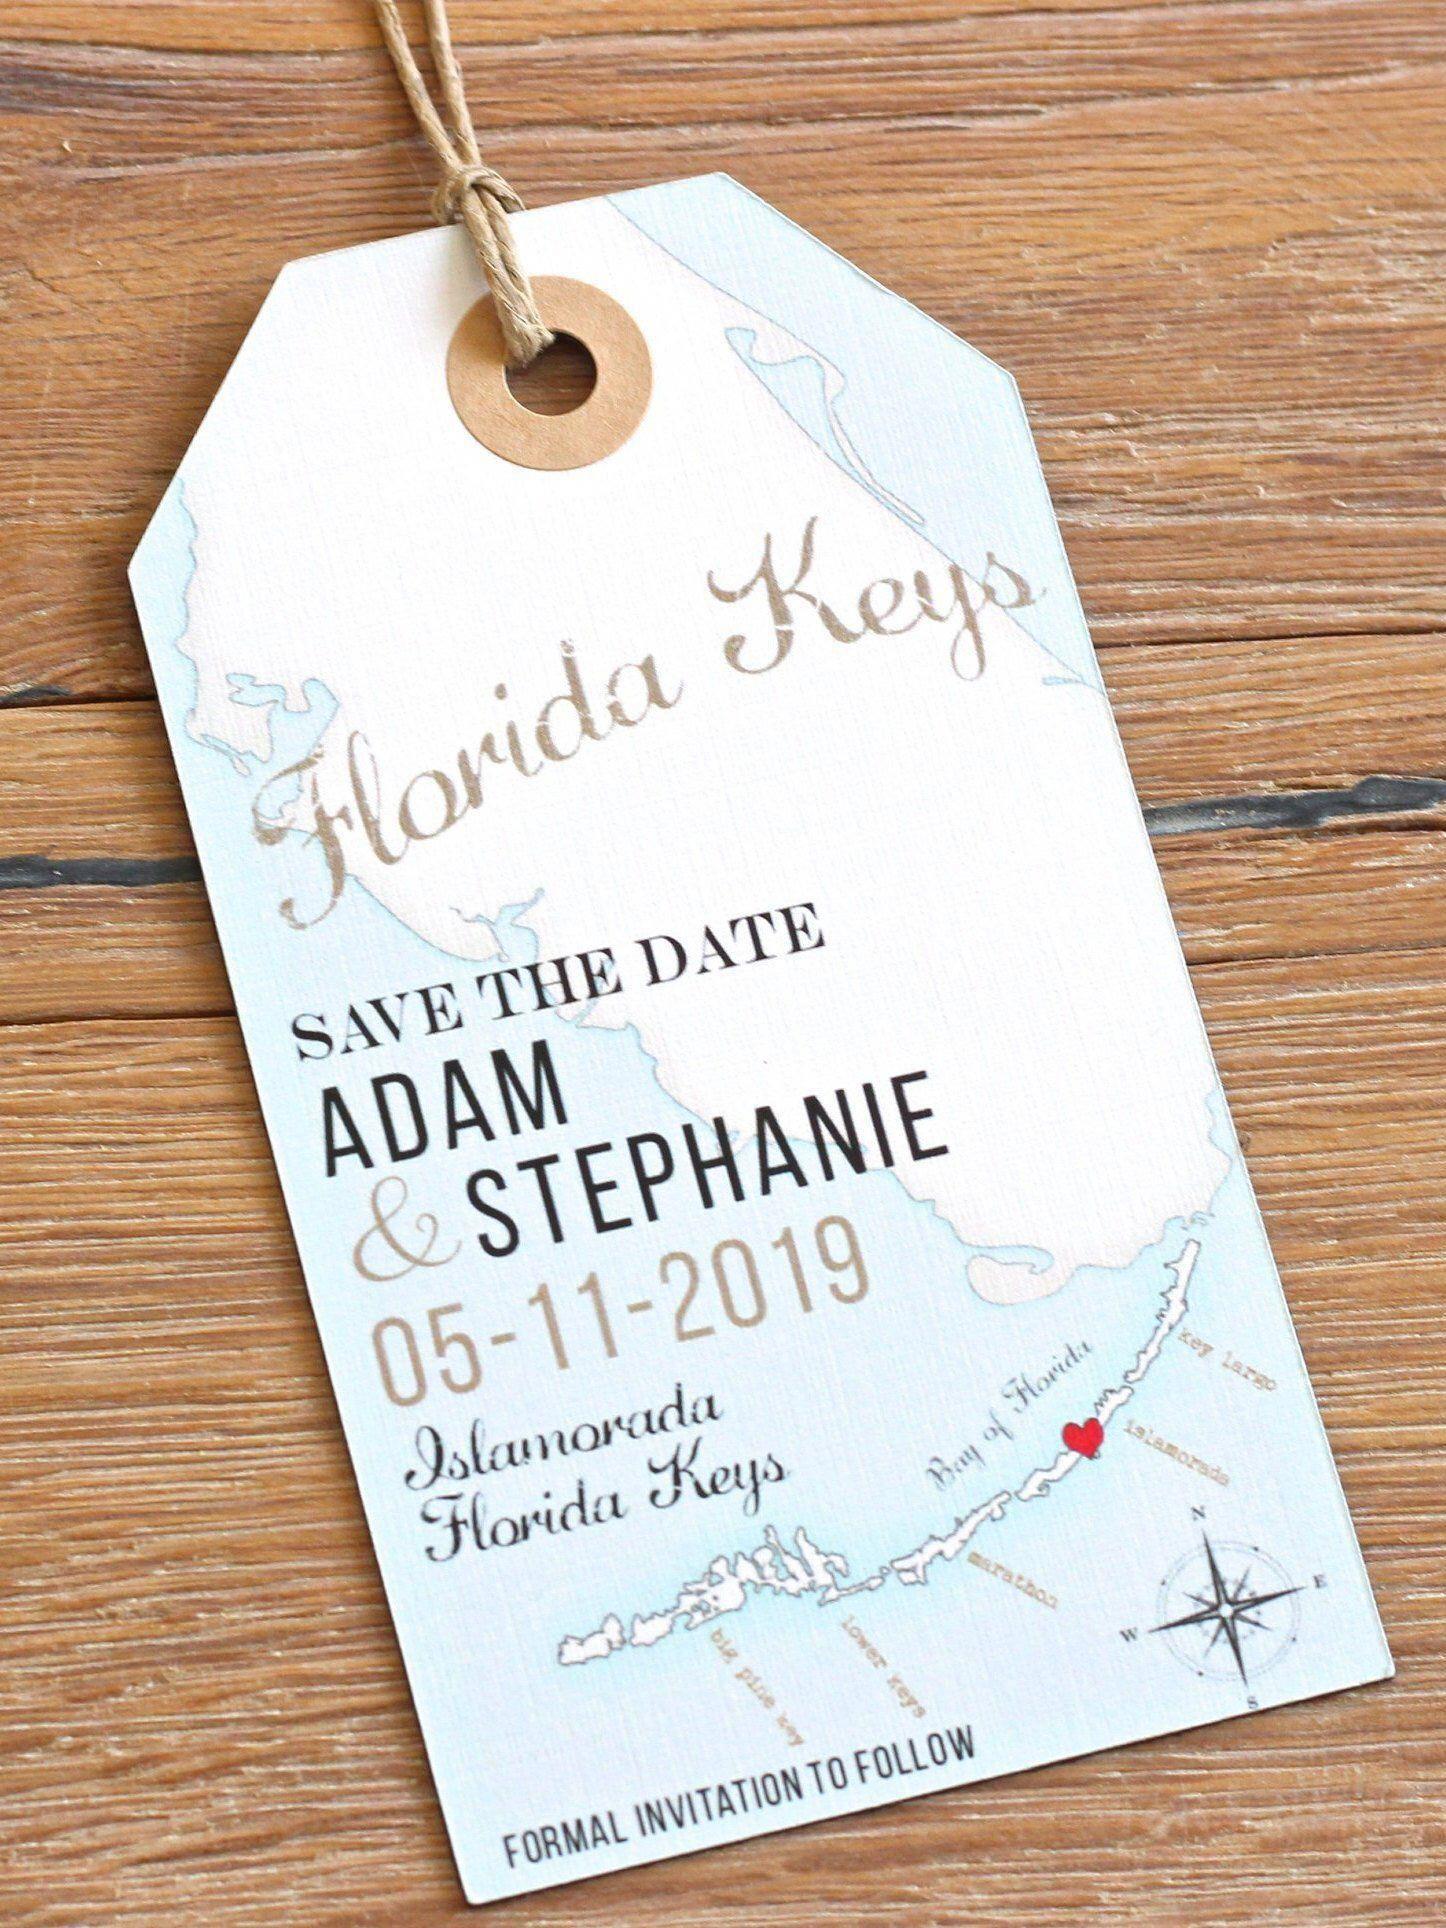 Florida Keys Save the Date invitation DESIGN FEE. Florida